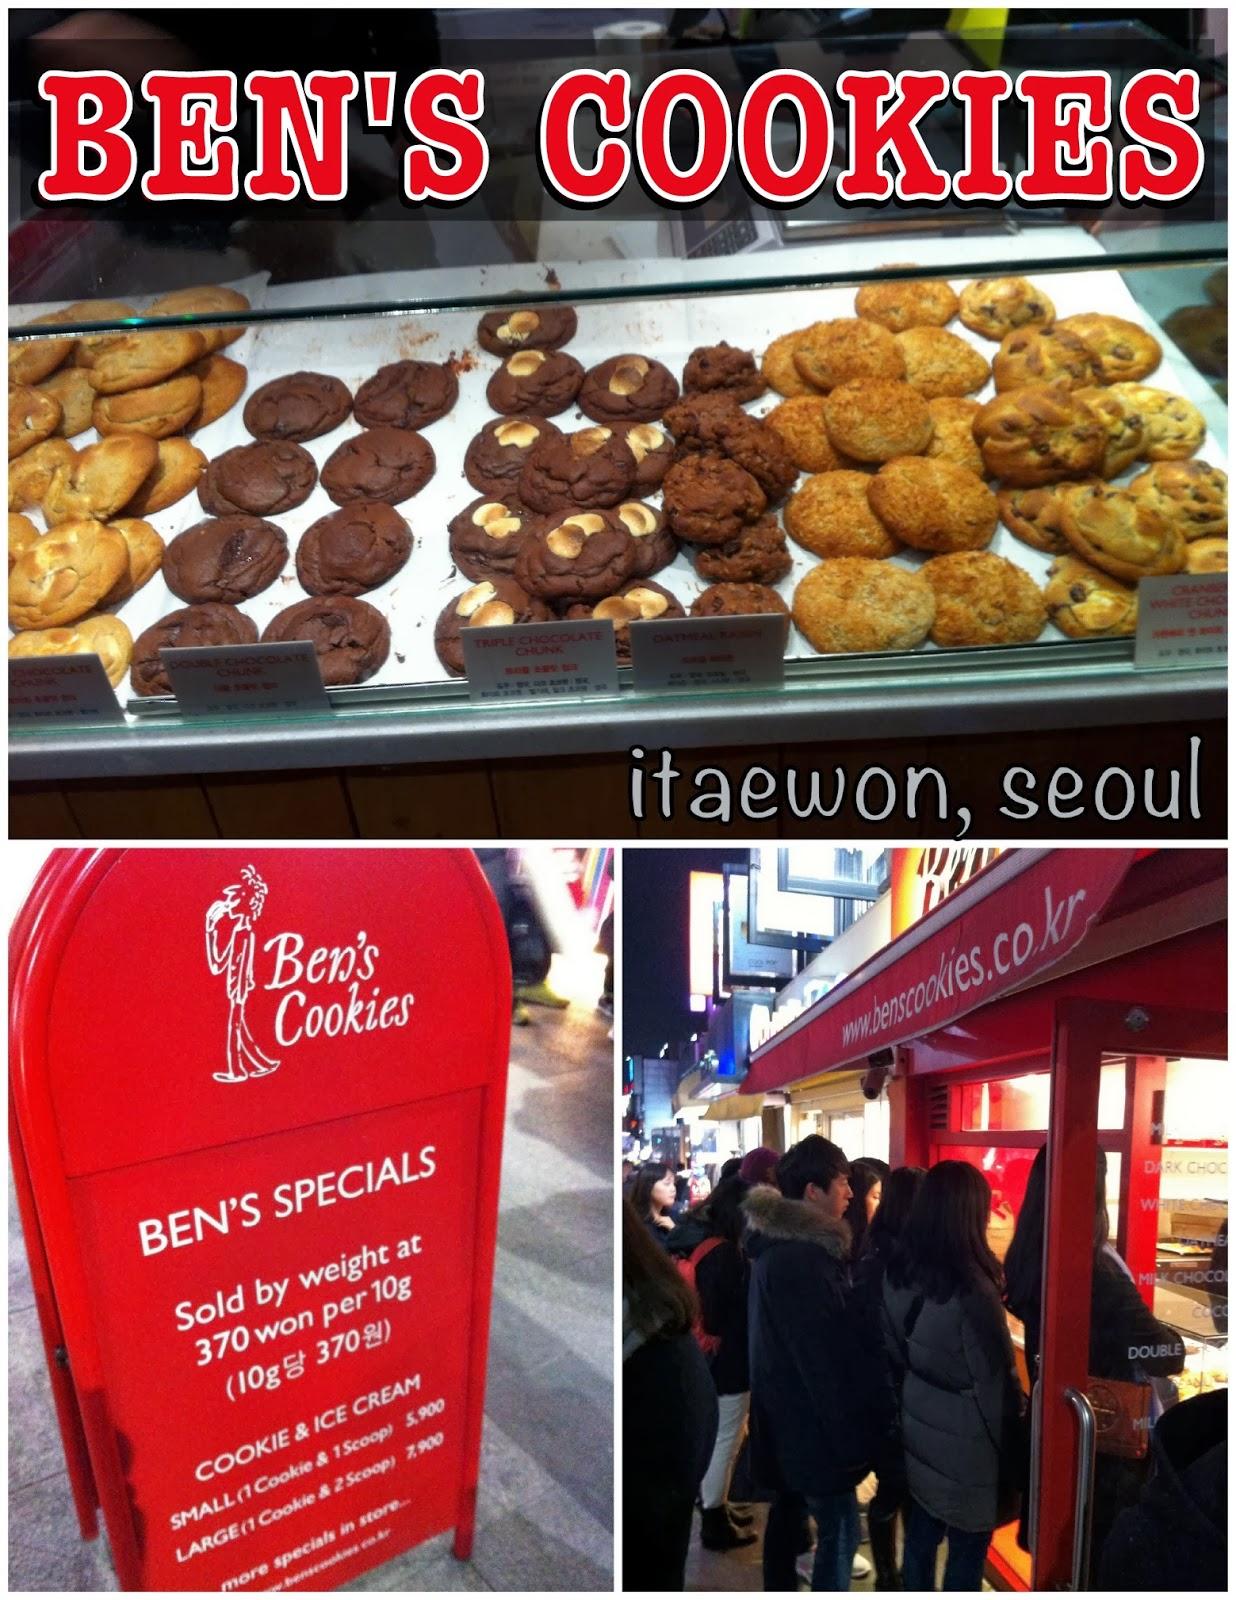 Ben's Cookies Itaewon Seoul